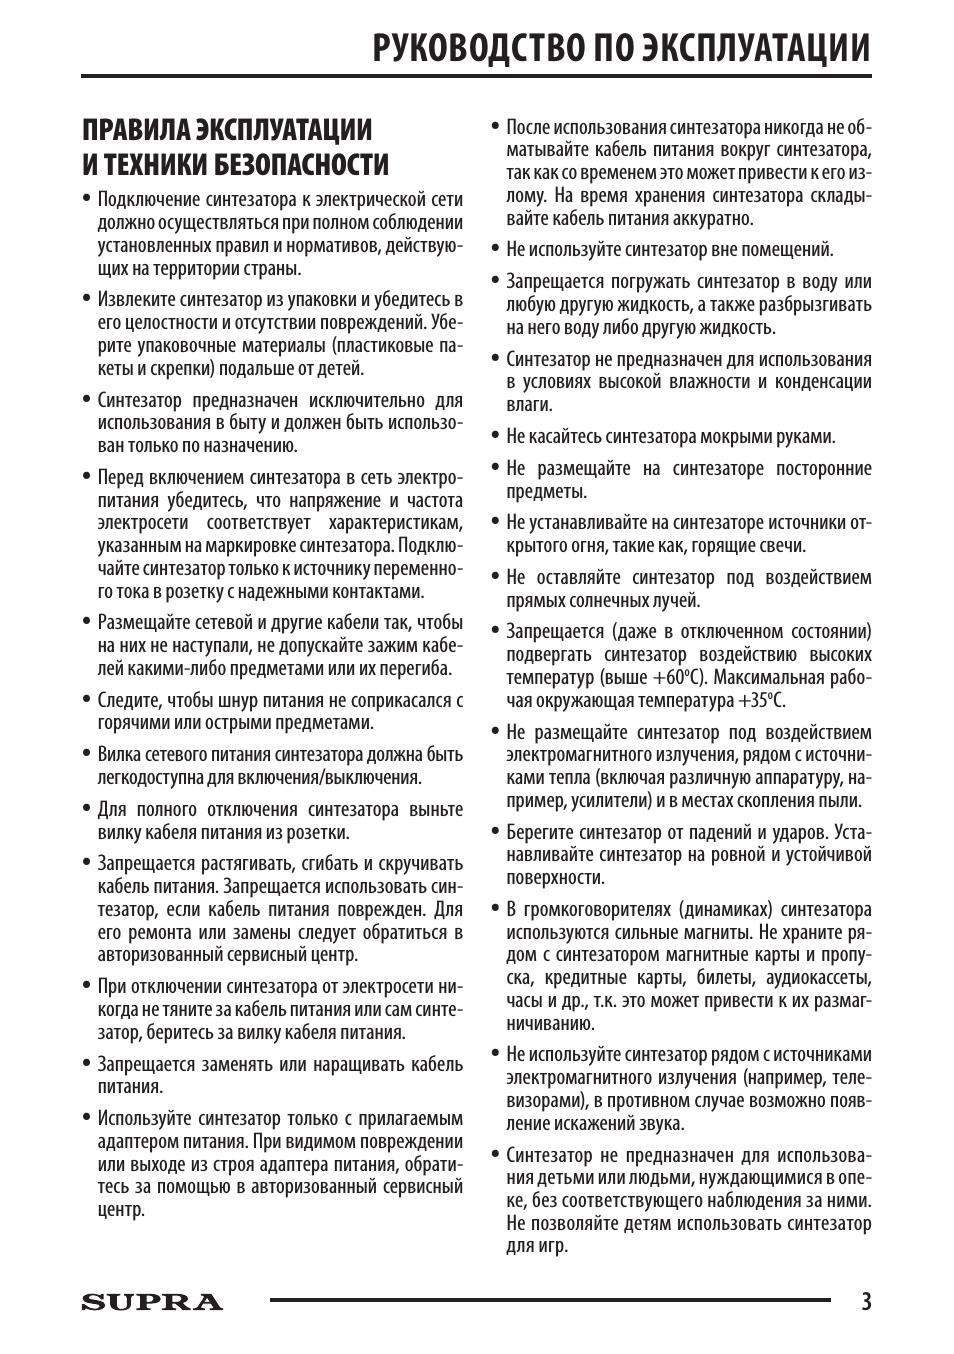 Руководство по эксплуатации, Правила эксплуатации и техники безопасности